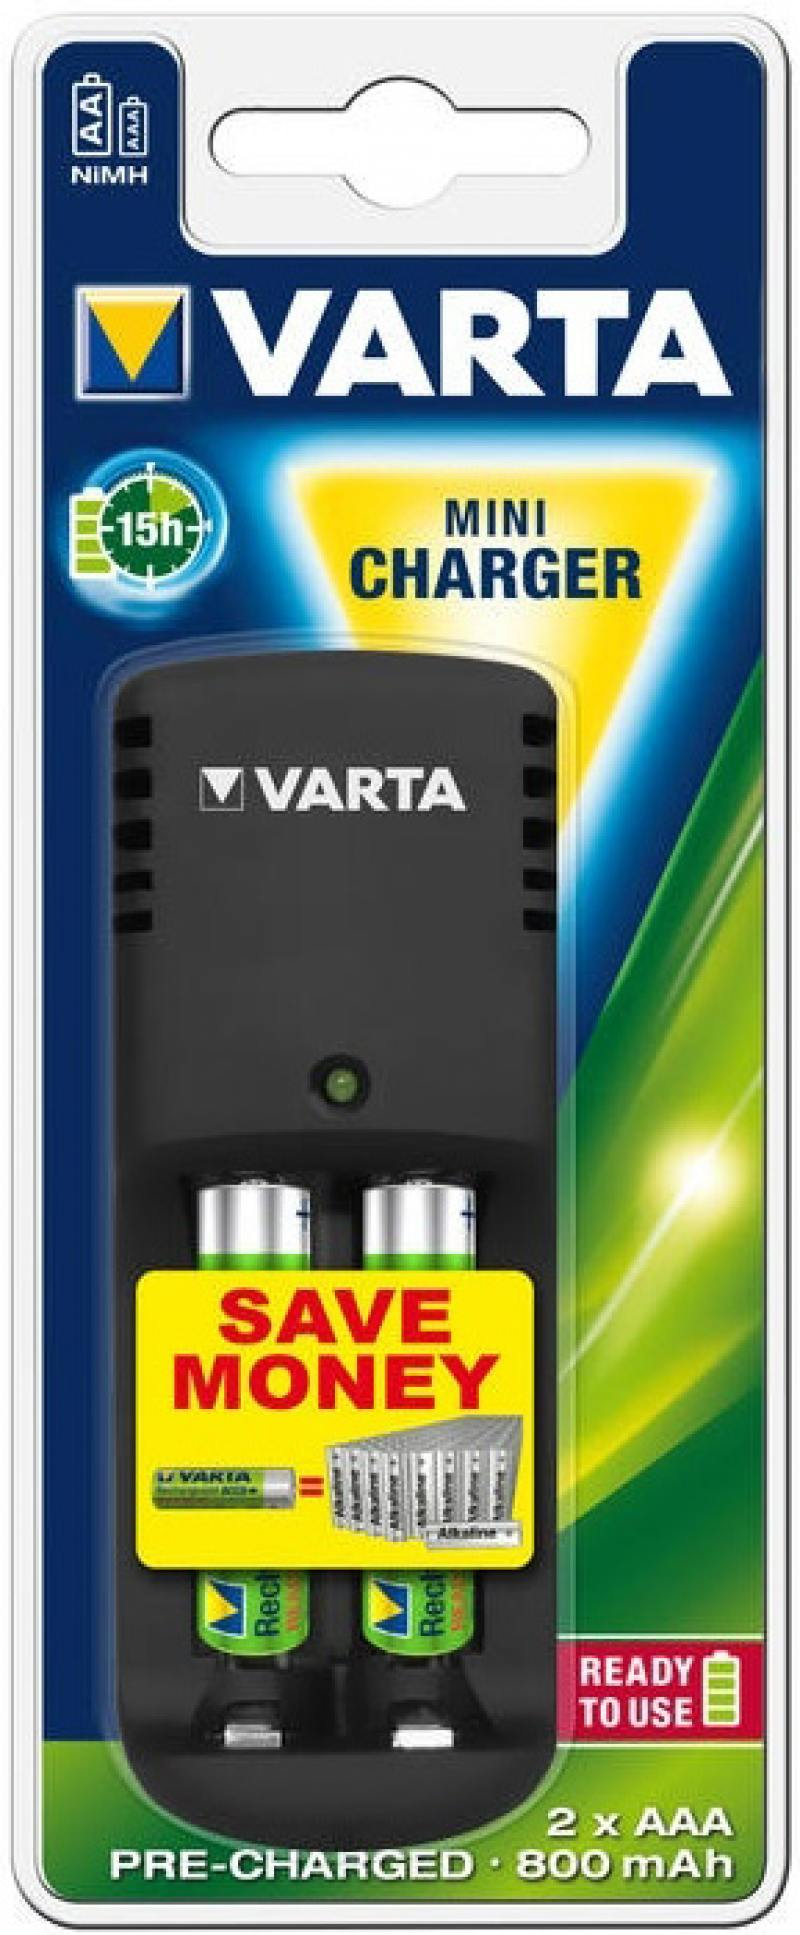 Зарядное устройство + аккумуляторы 800 mAh Varta Mini Charger AA/AAA 2 шт аккумуляторы varta aaa r2u 800 мач блистер 4шт